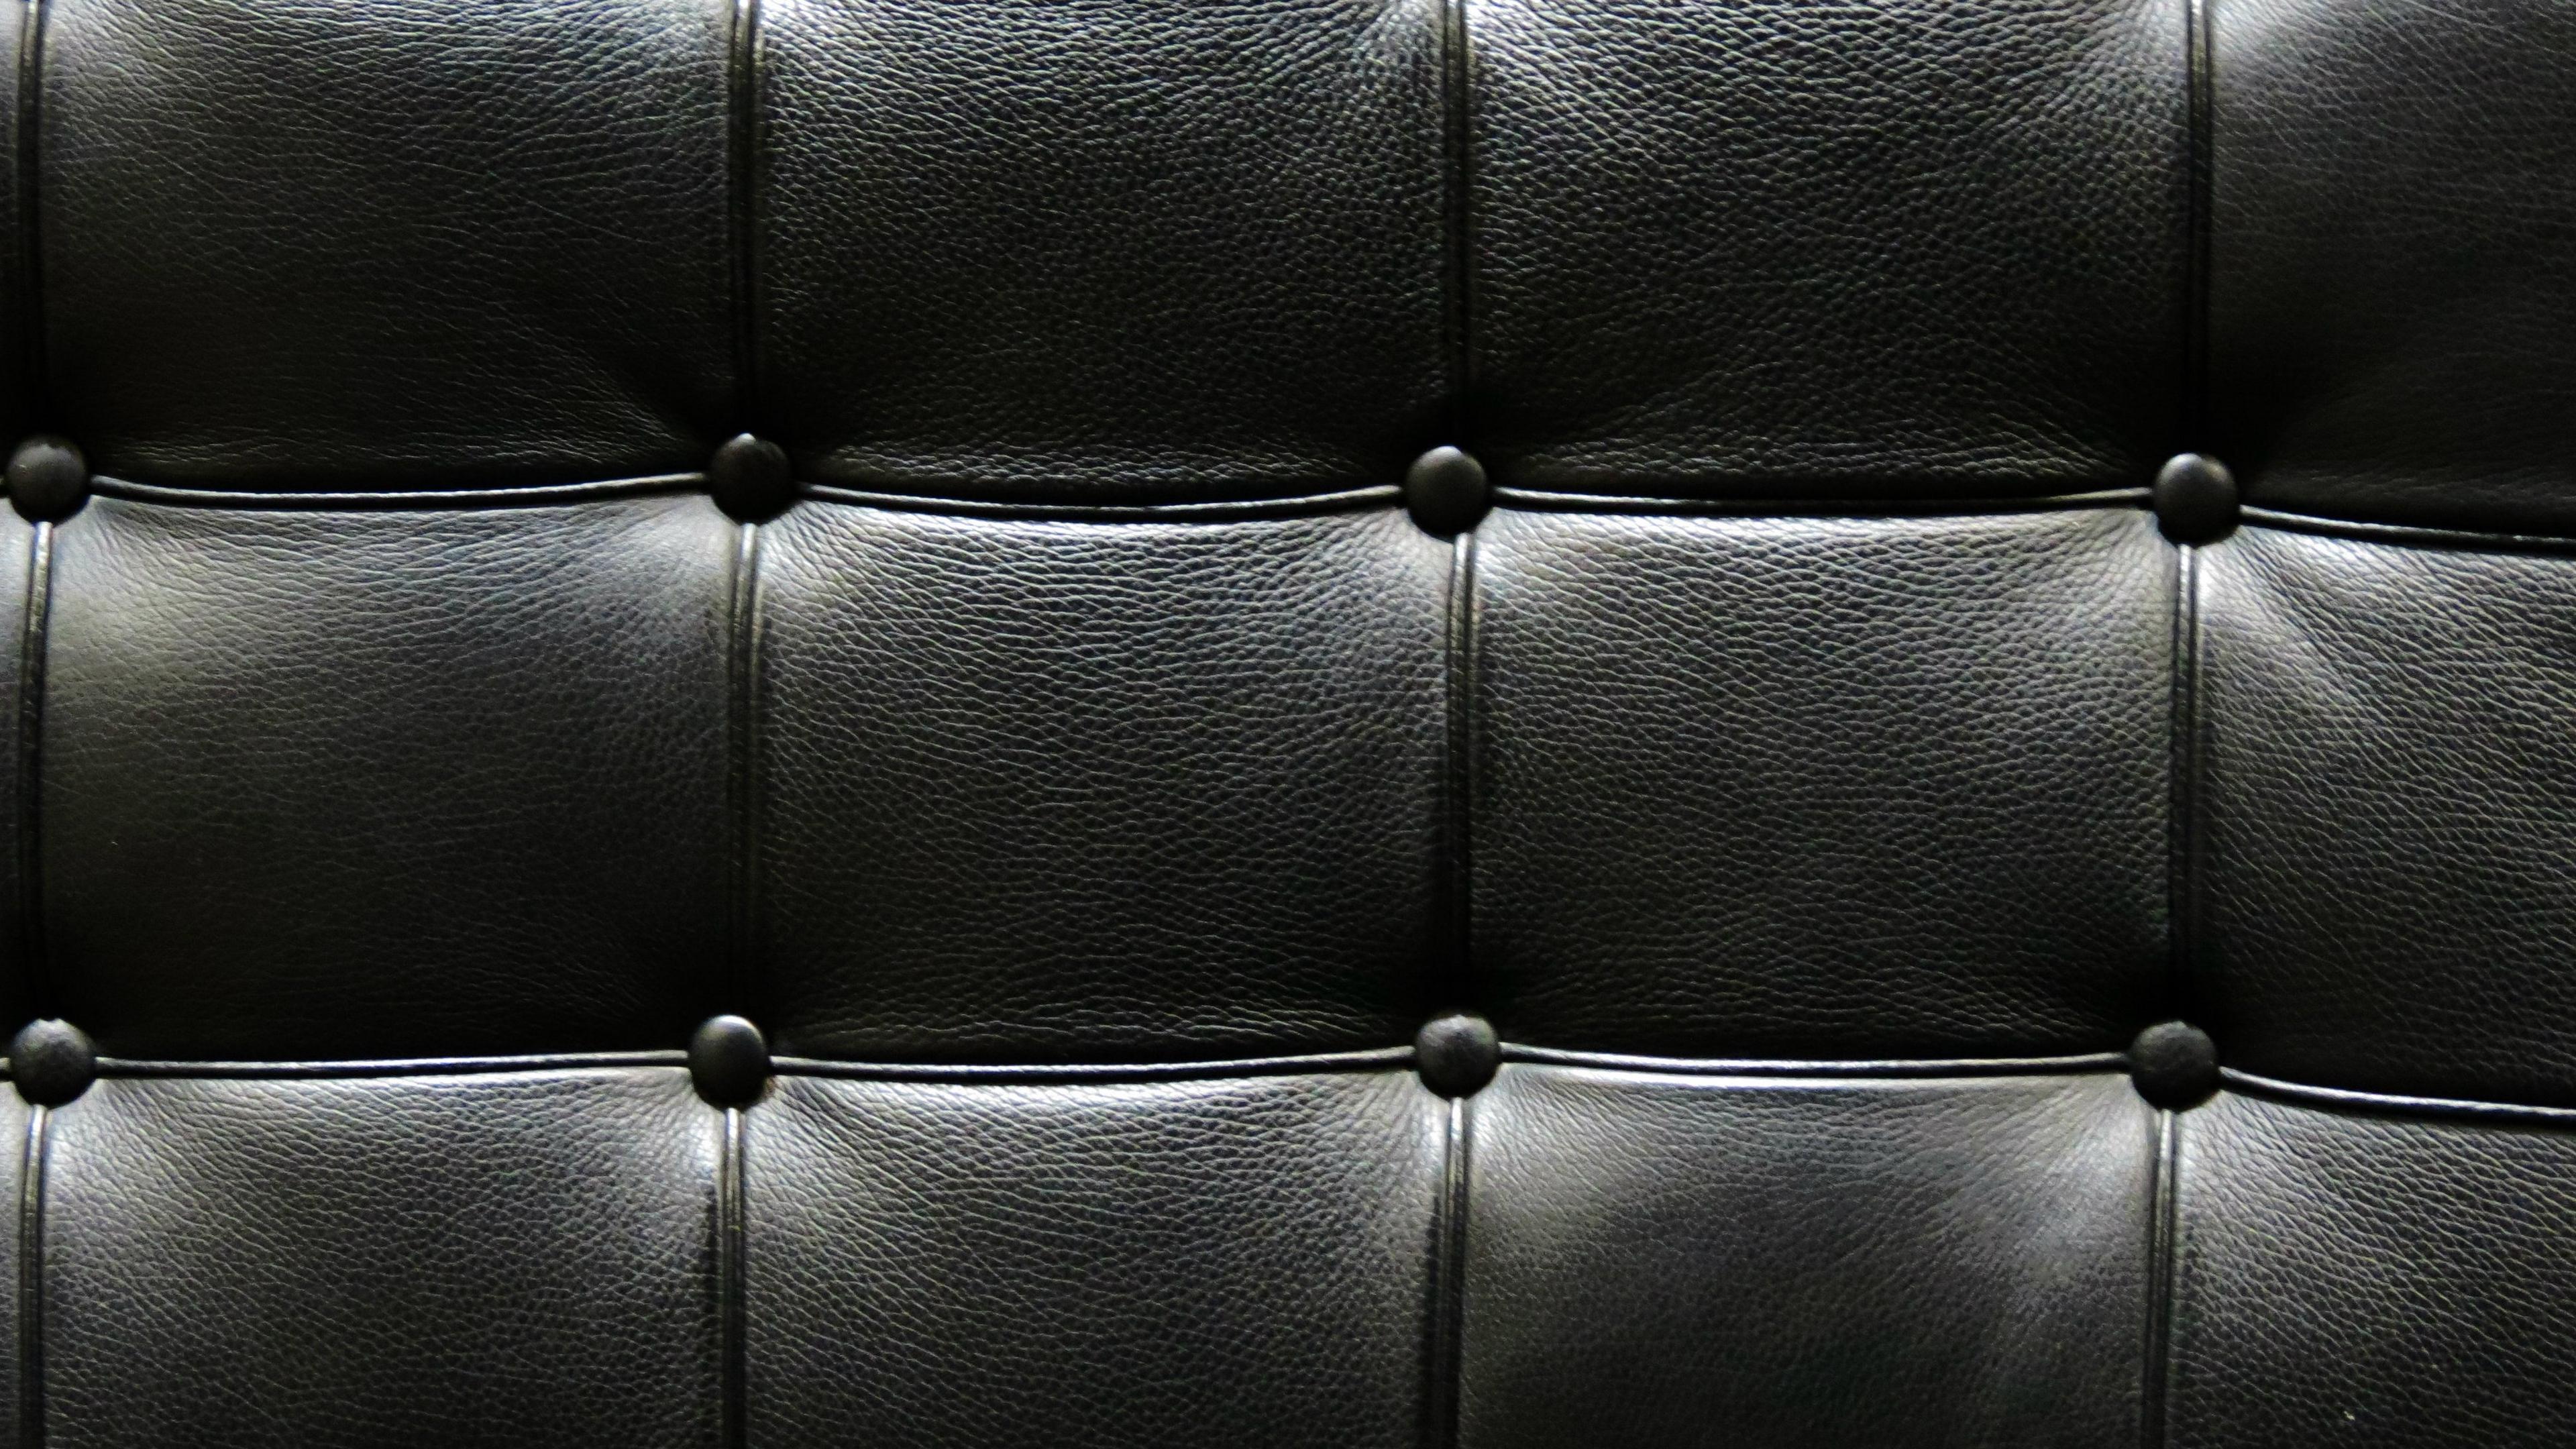 leather black spots 4k 1536097749 - leather, black, spots 4k - spots, leather, Black